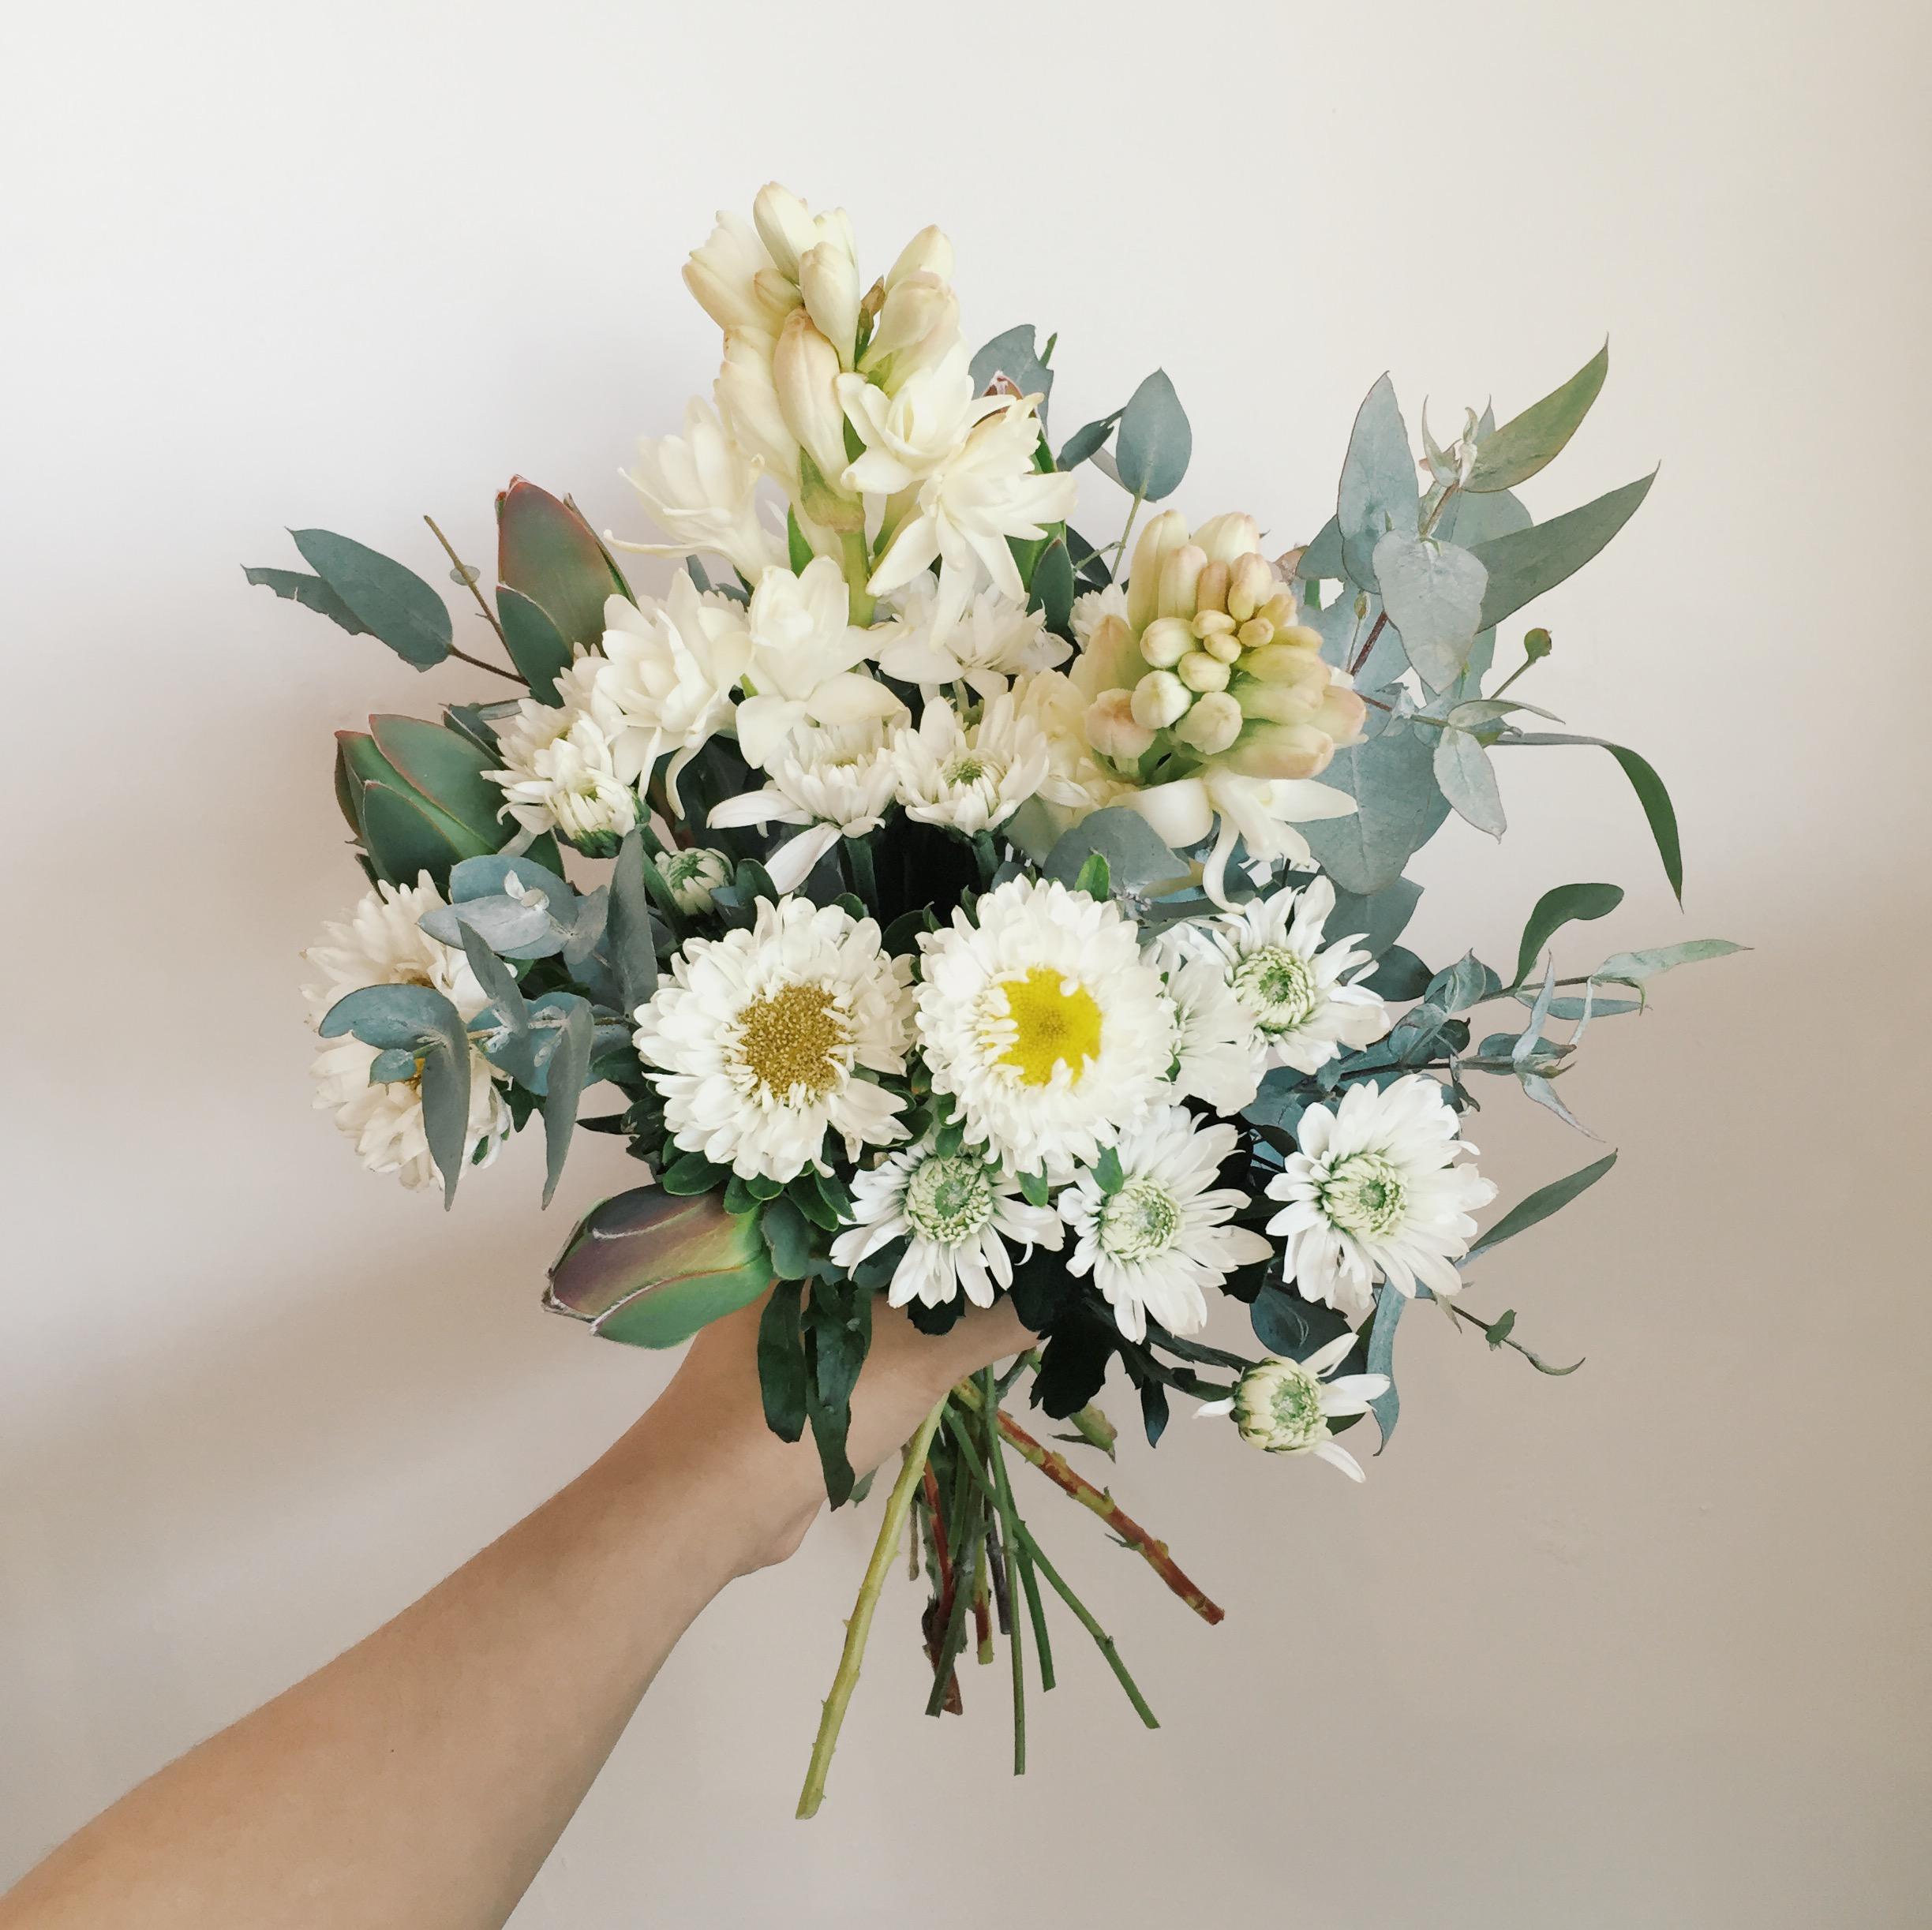 Weekly Fresh Flower Fridays at Beau Est Mien 2013 - 2015